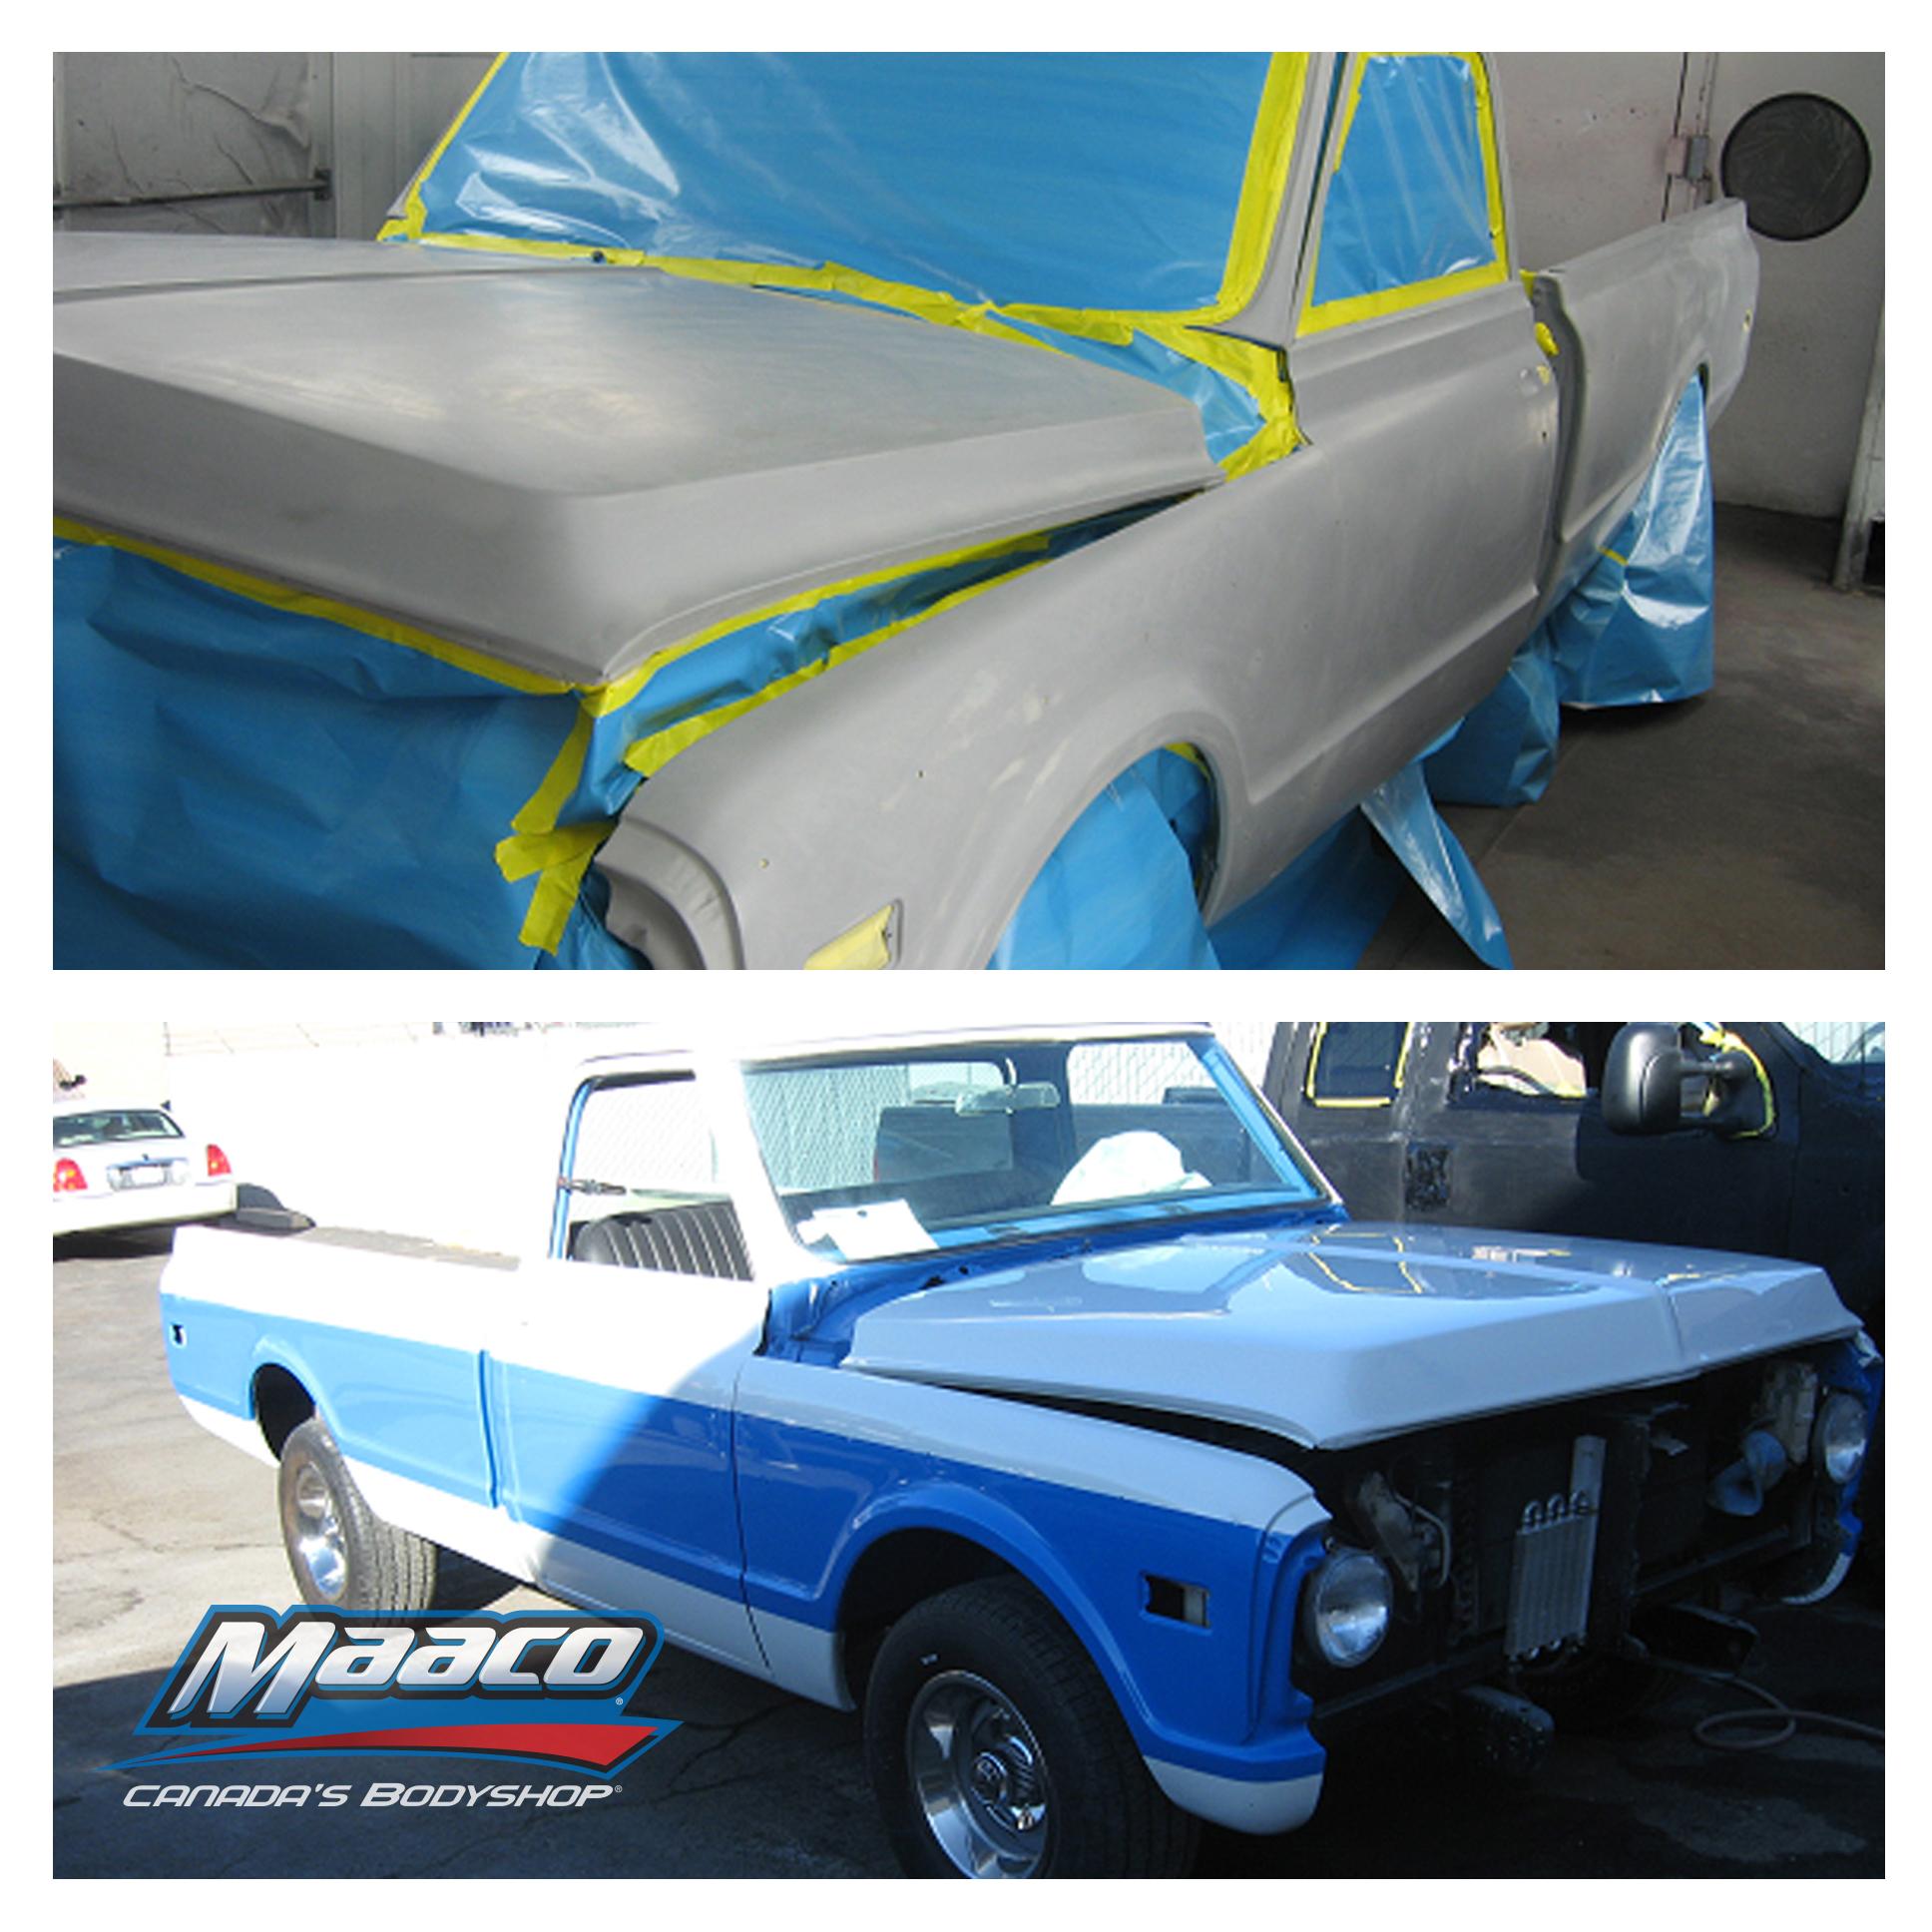 Maaco Collision Repair & Auto Painting in Kelowna